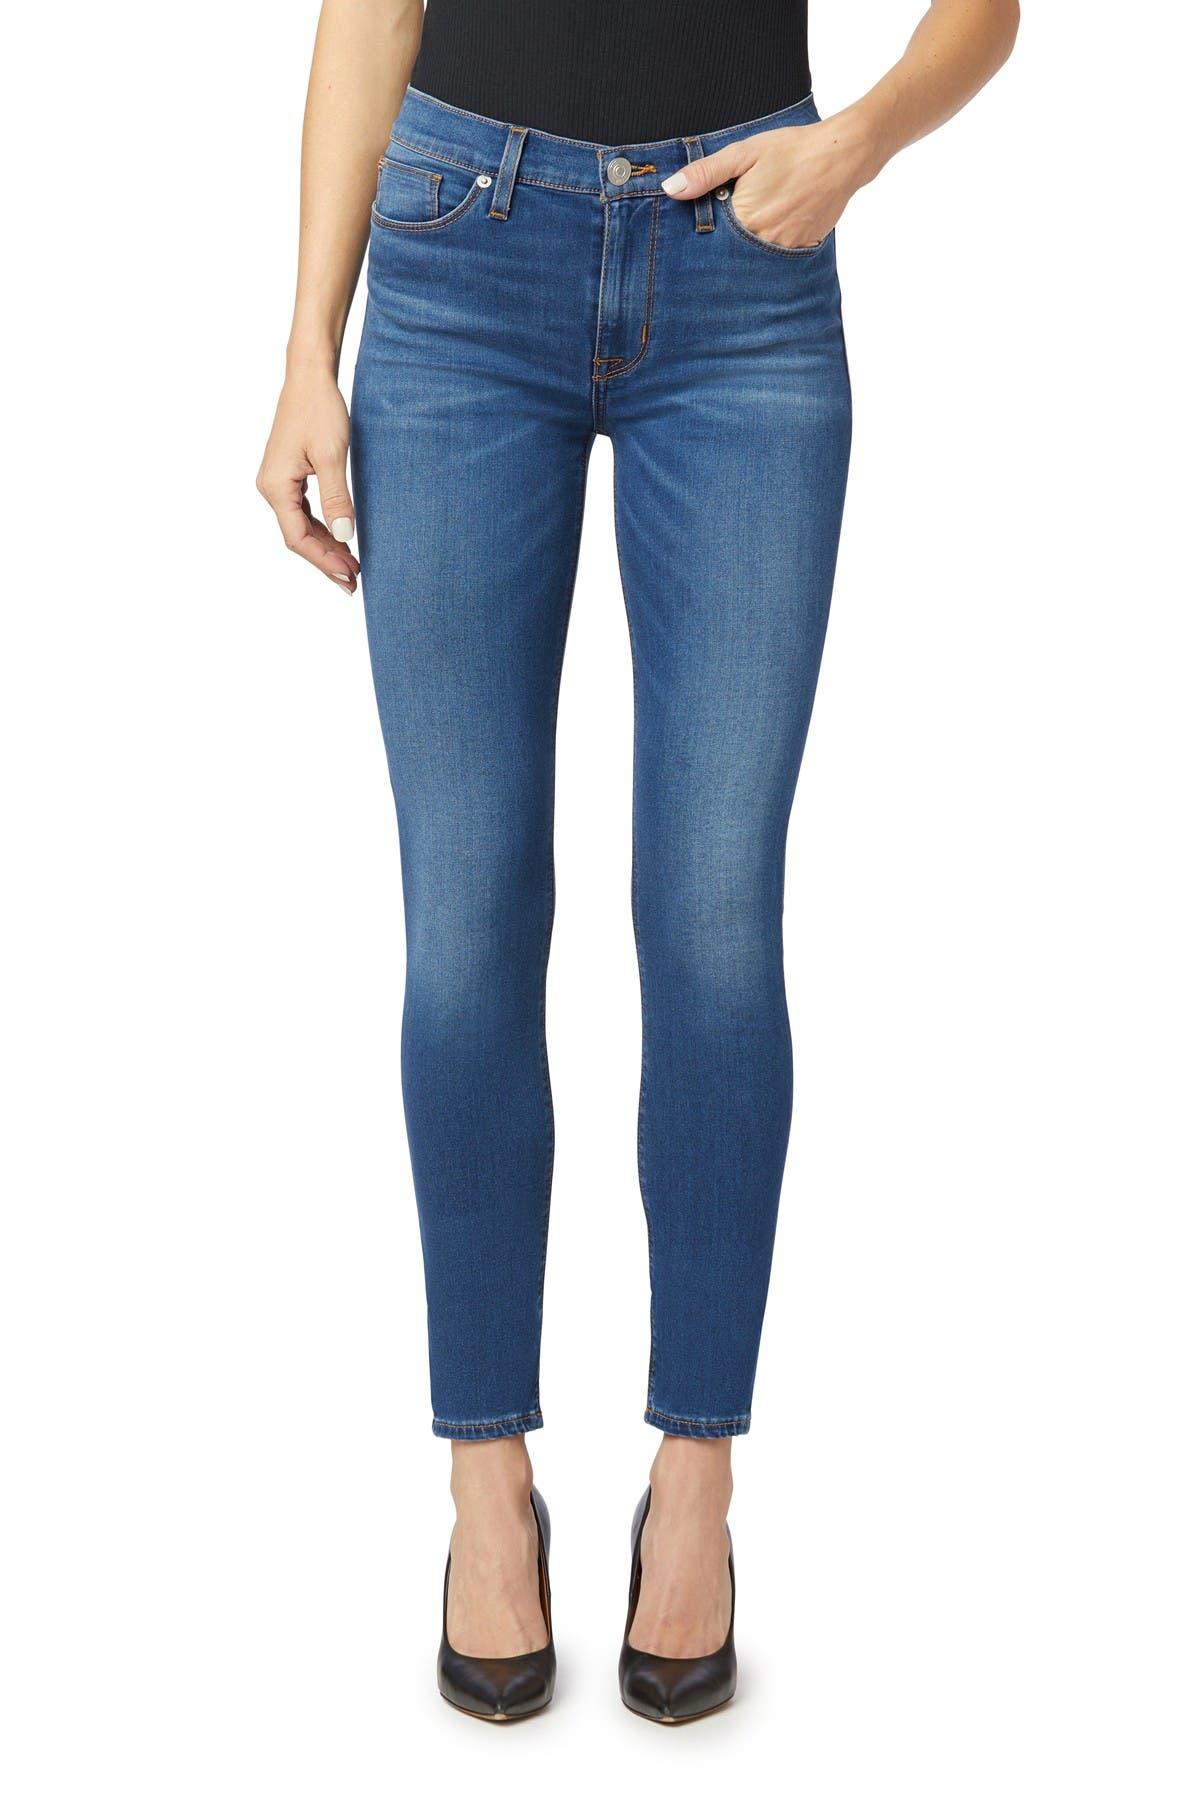 Image of HUDSON Jeans Natalie Midrise Super Skinny Ankle Jeans